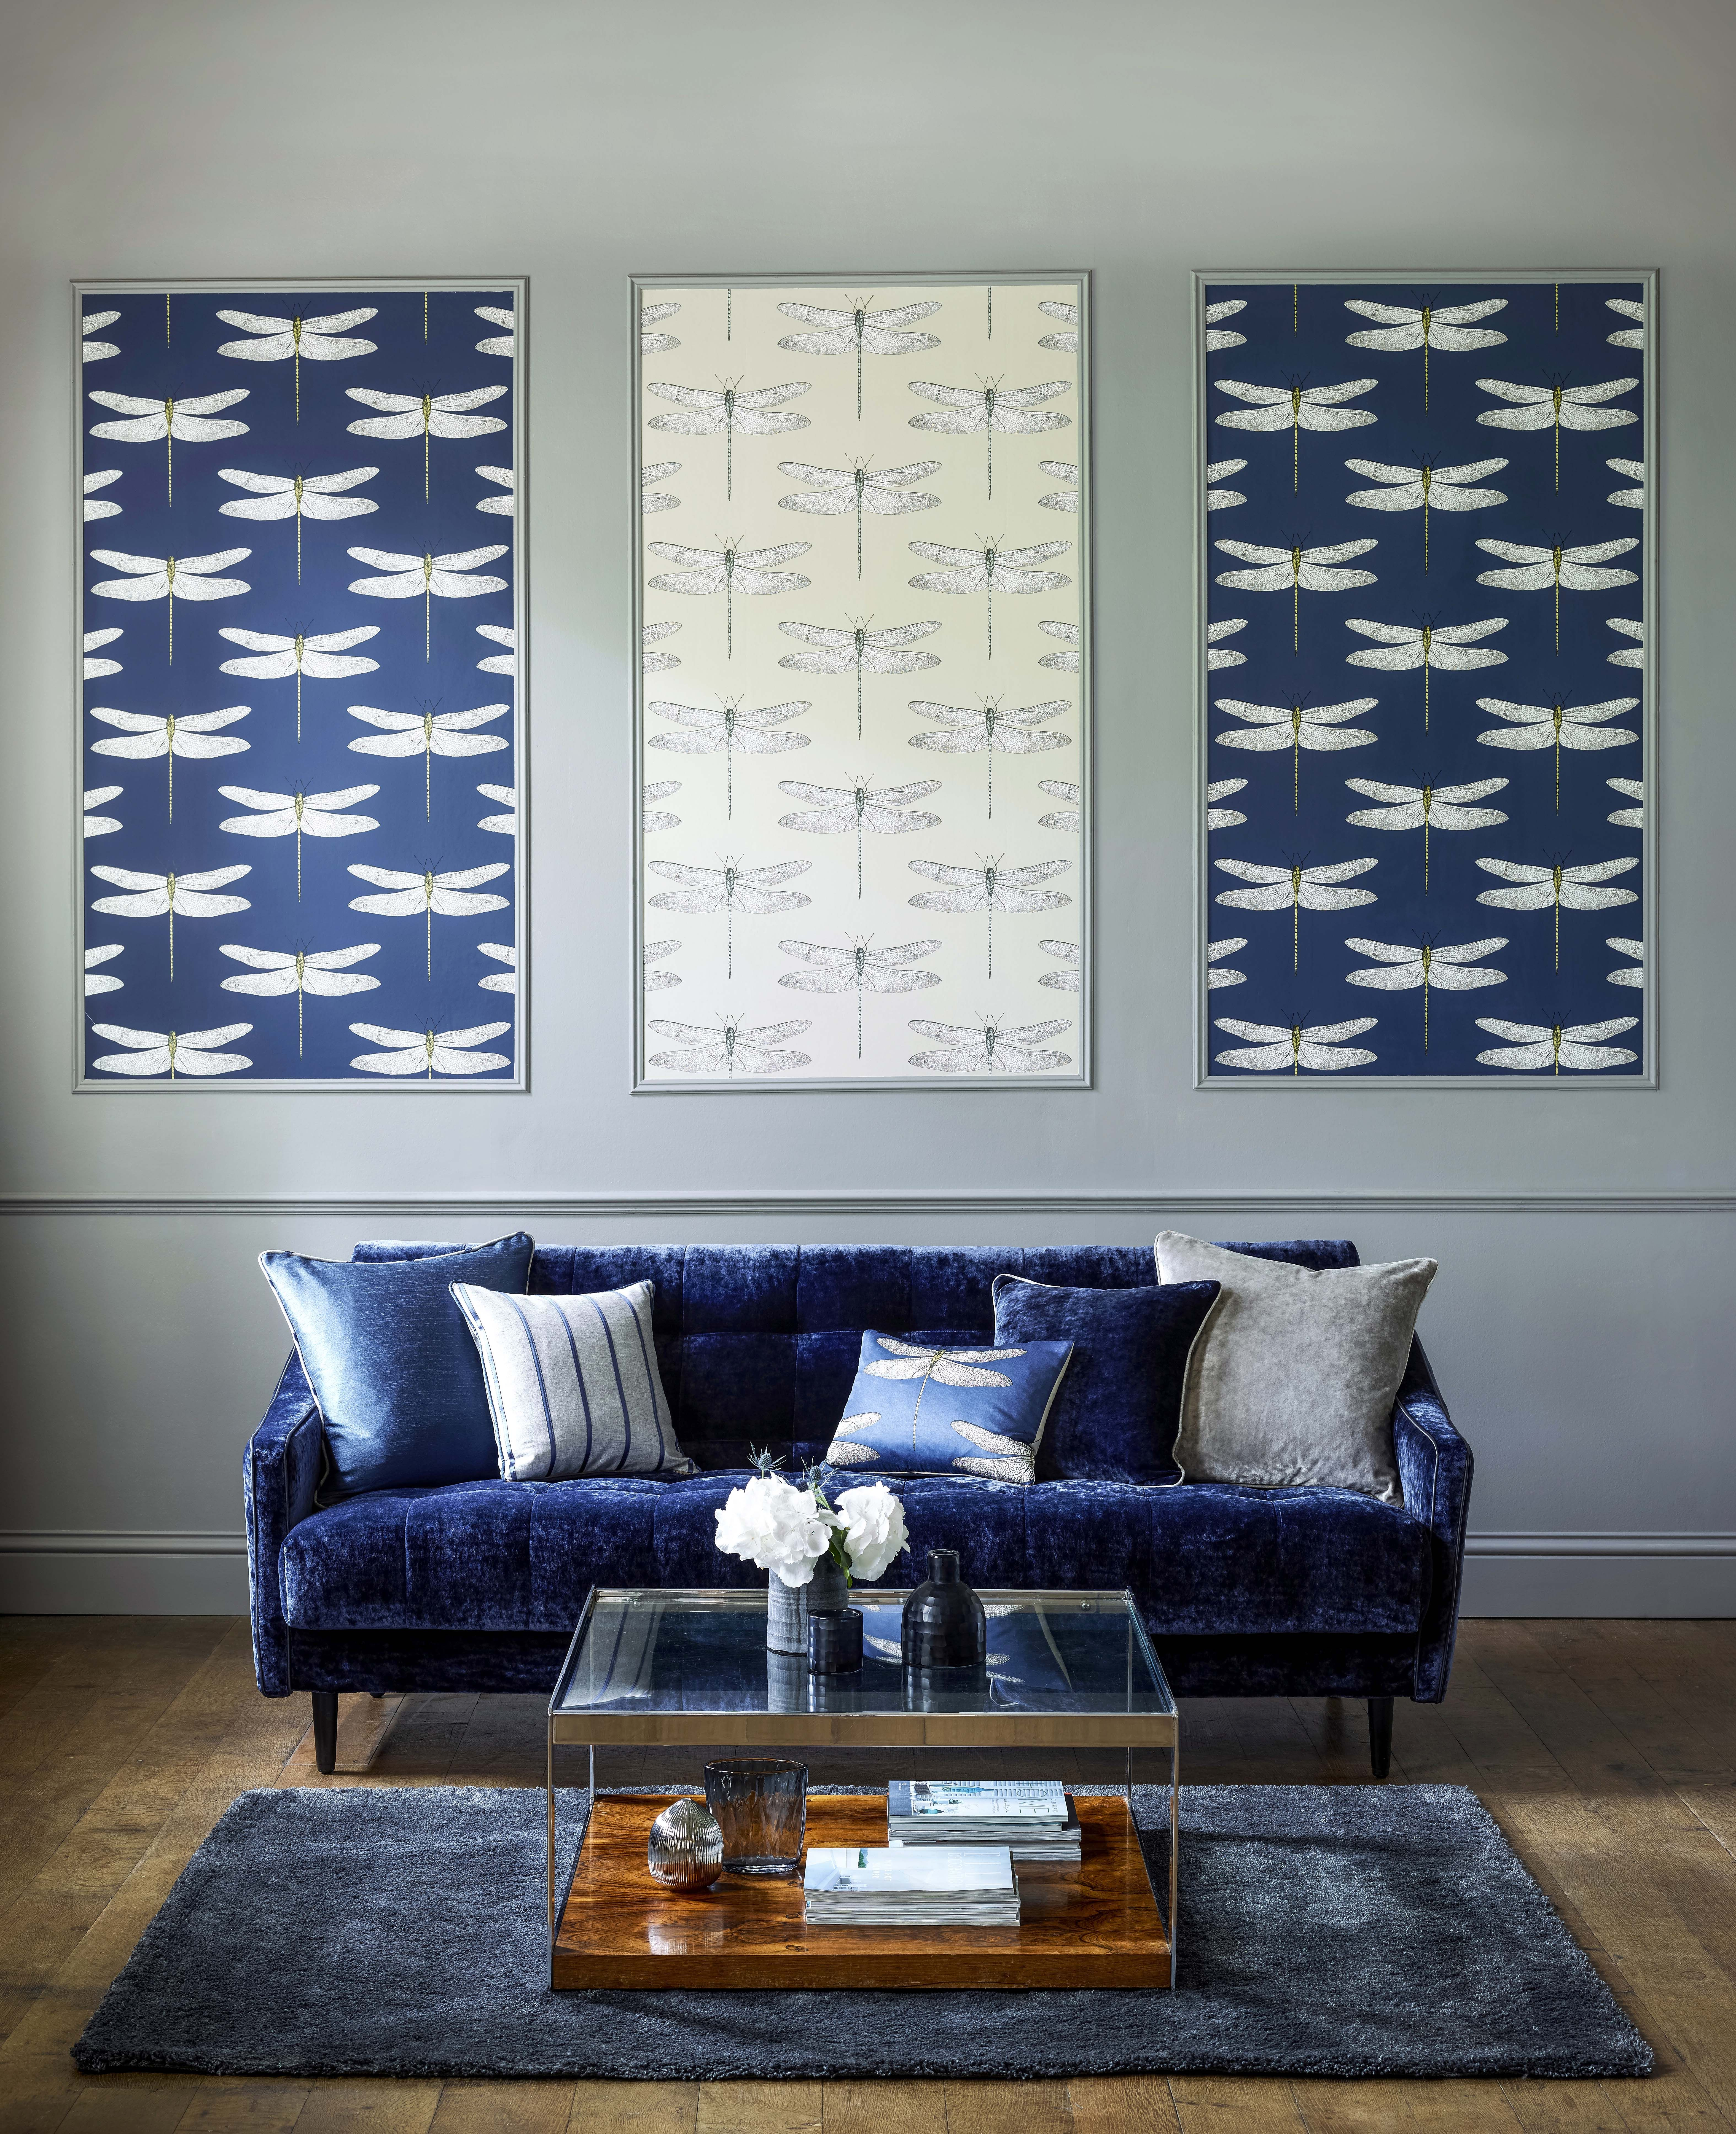 Wallpaper, Harlequin, Dragonfly, Blue Wall